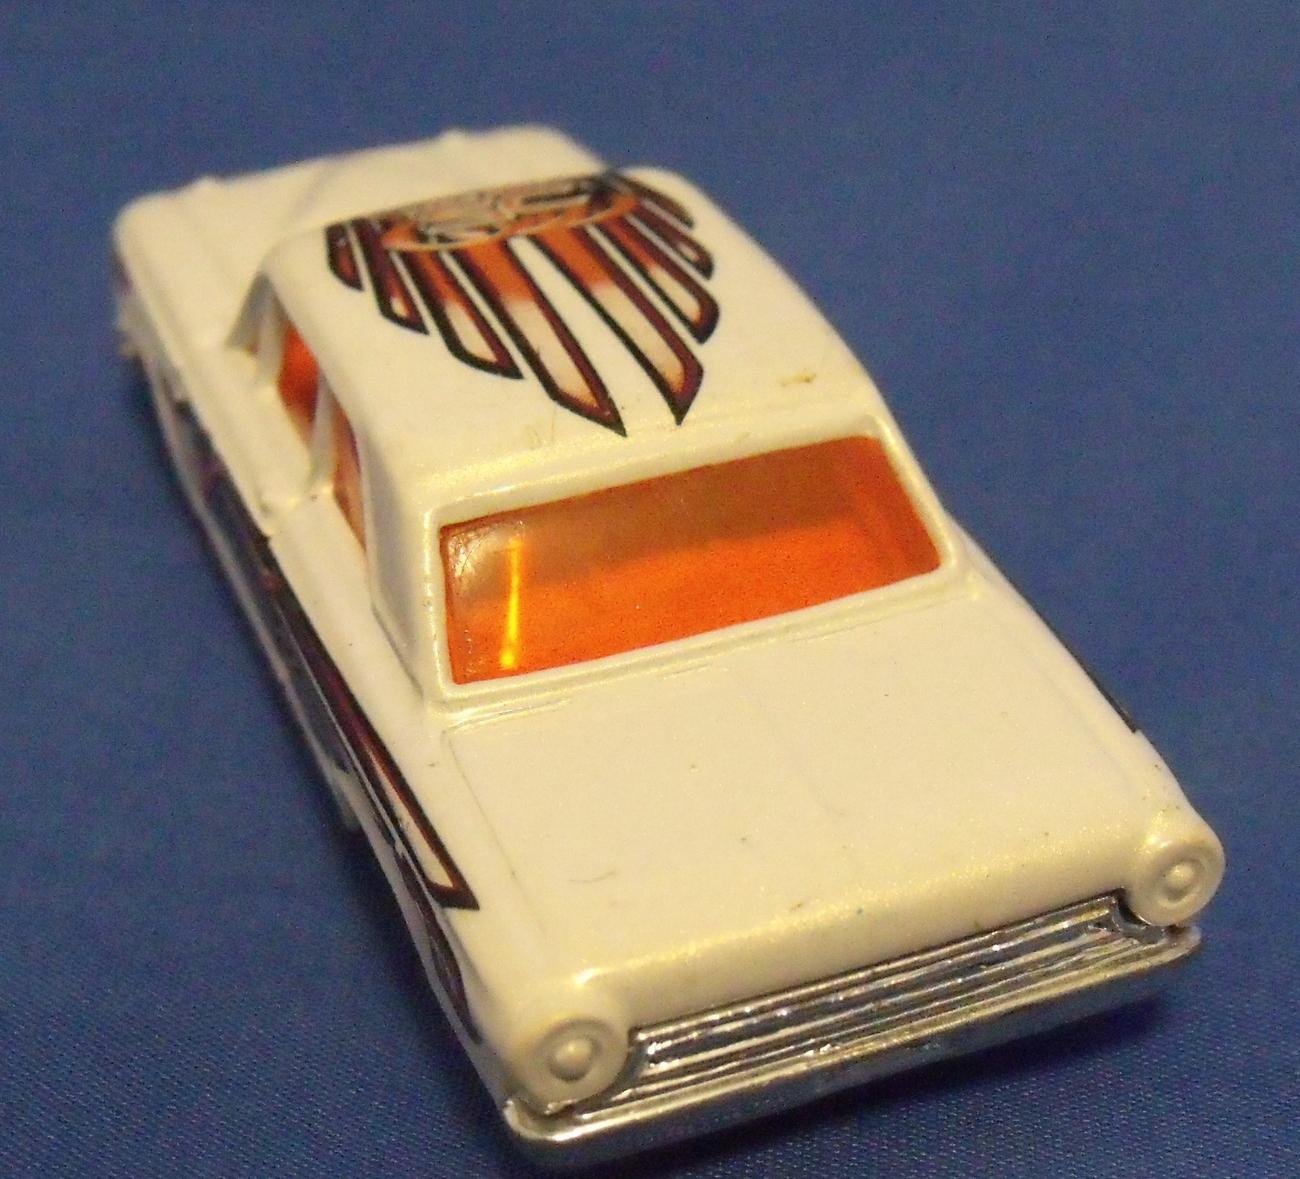 Toys Mattel 2001 Hot Wheels Ford Thunder Reptile Eater Car